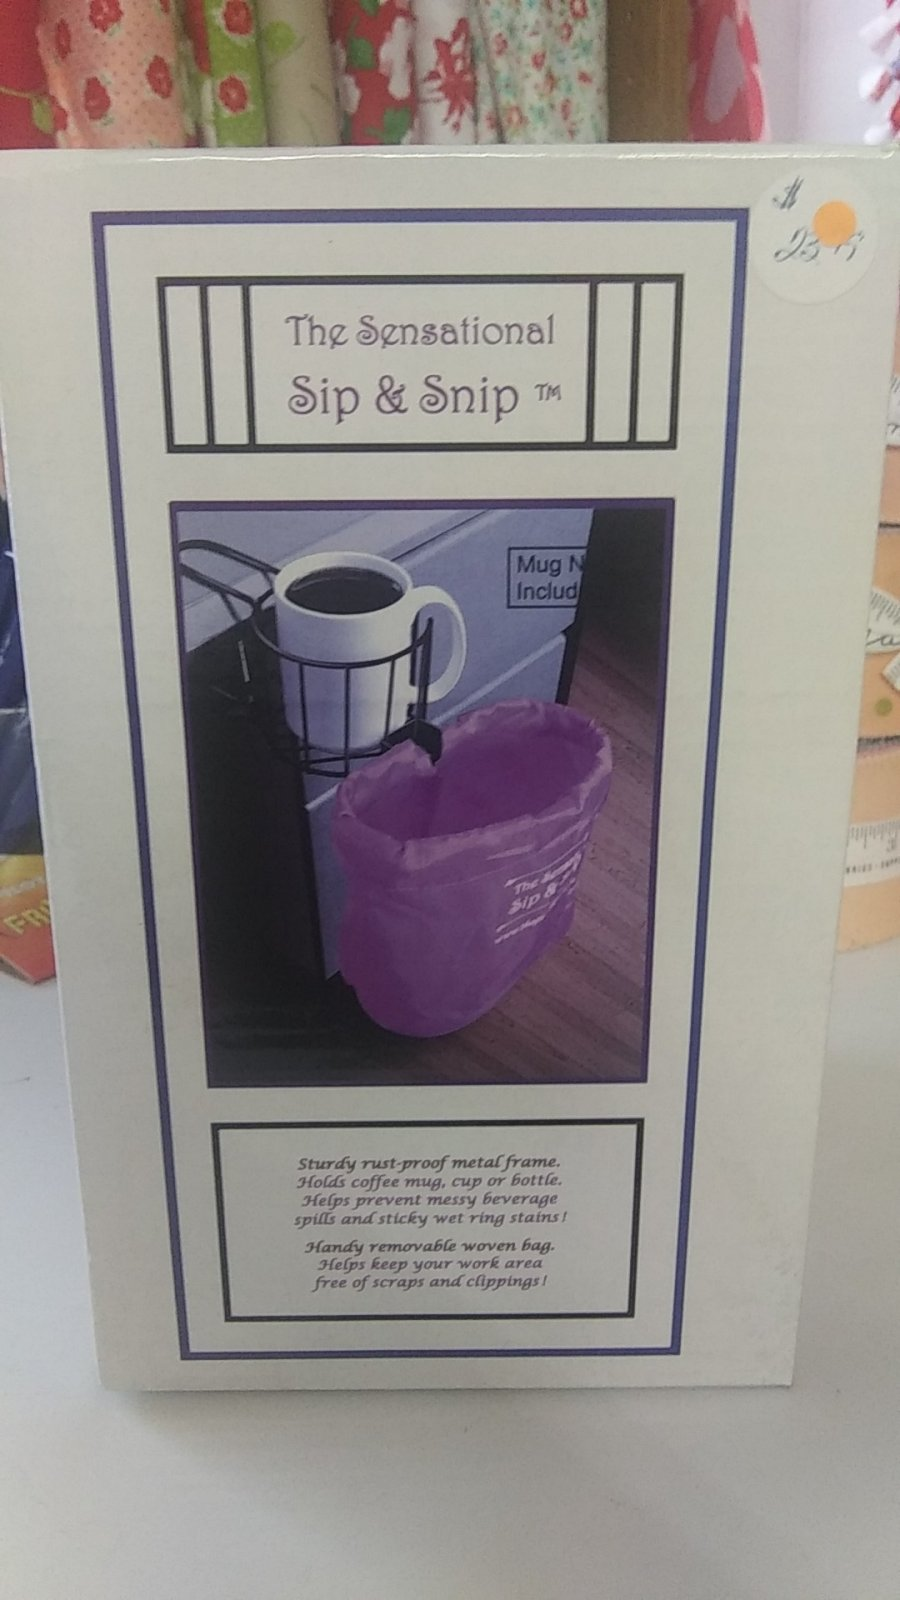 The Sensational Sip & Snip